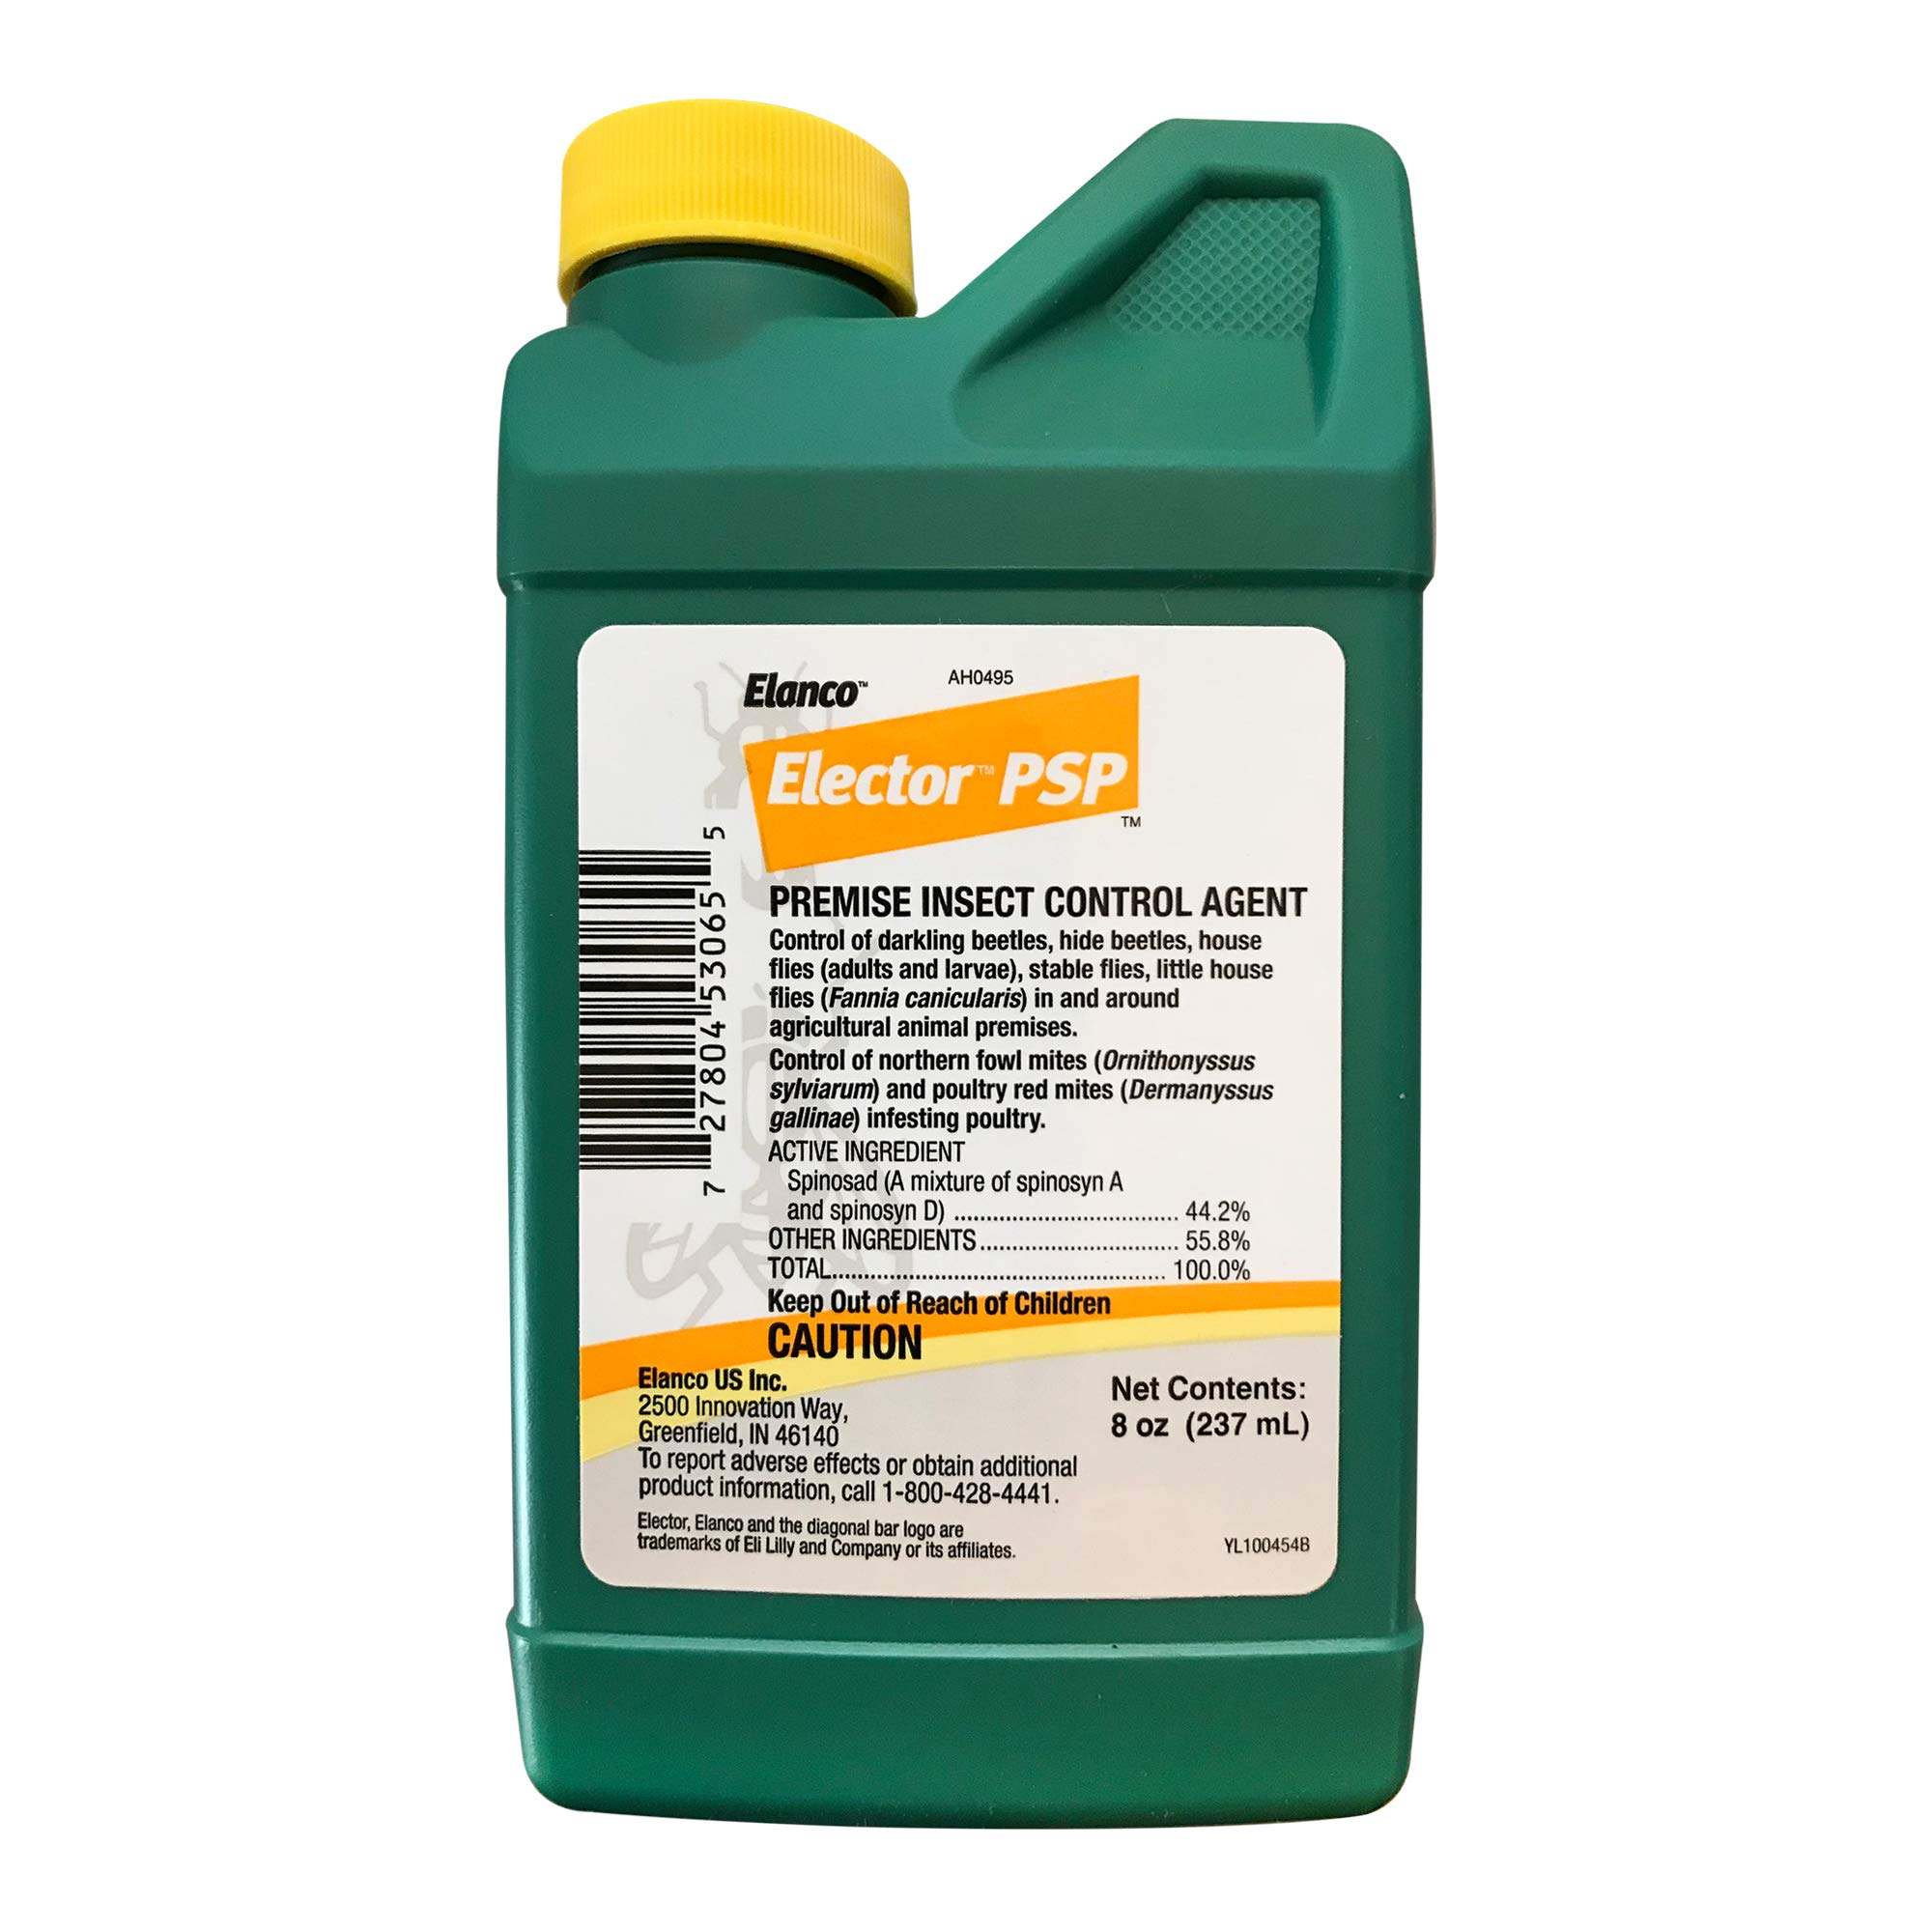 Elector Psp Premise Spray 8 oz by Elanco (Image #1)